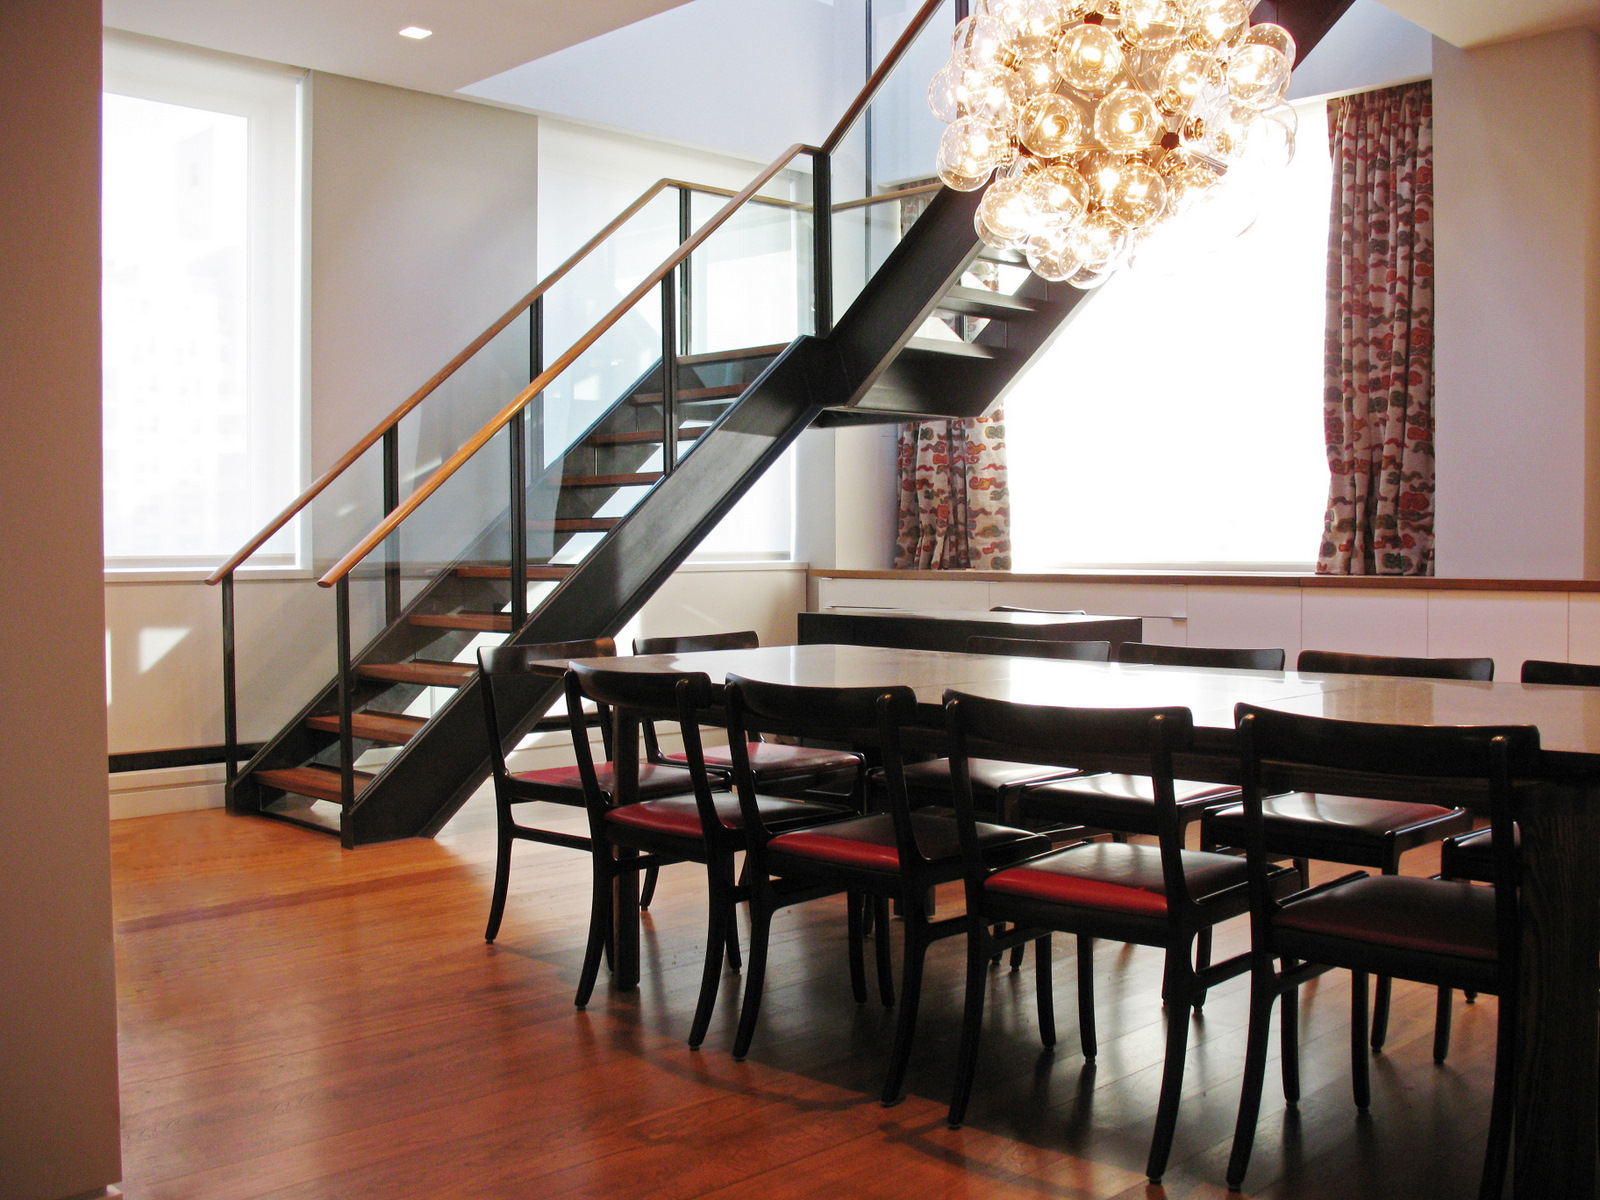 Лестница на металлическом каркасе в лаконичном дизайне